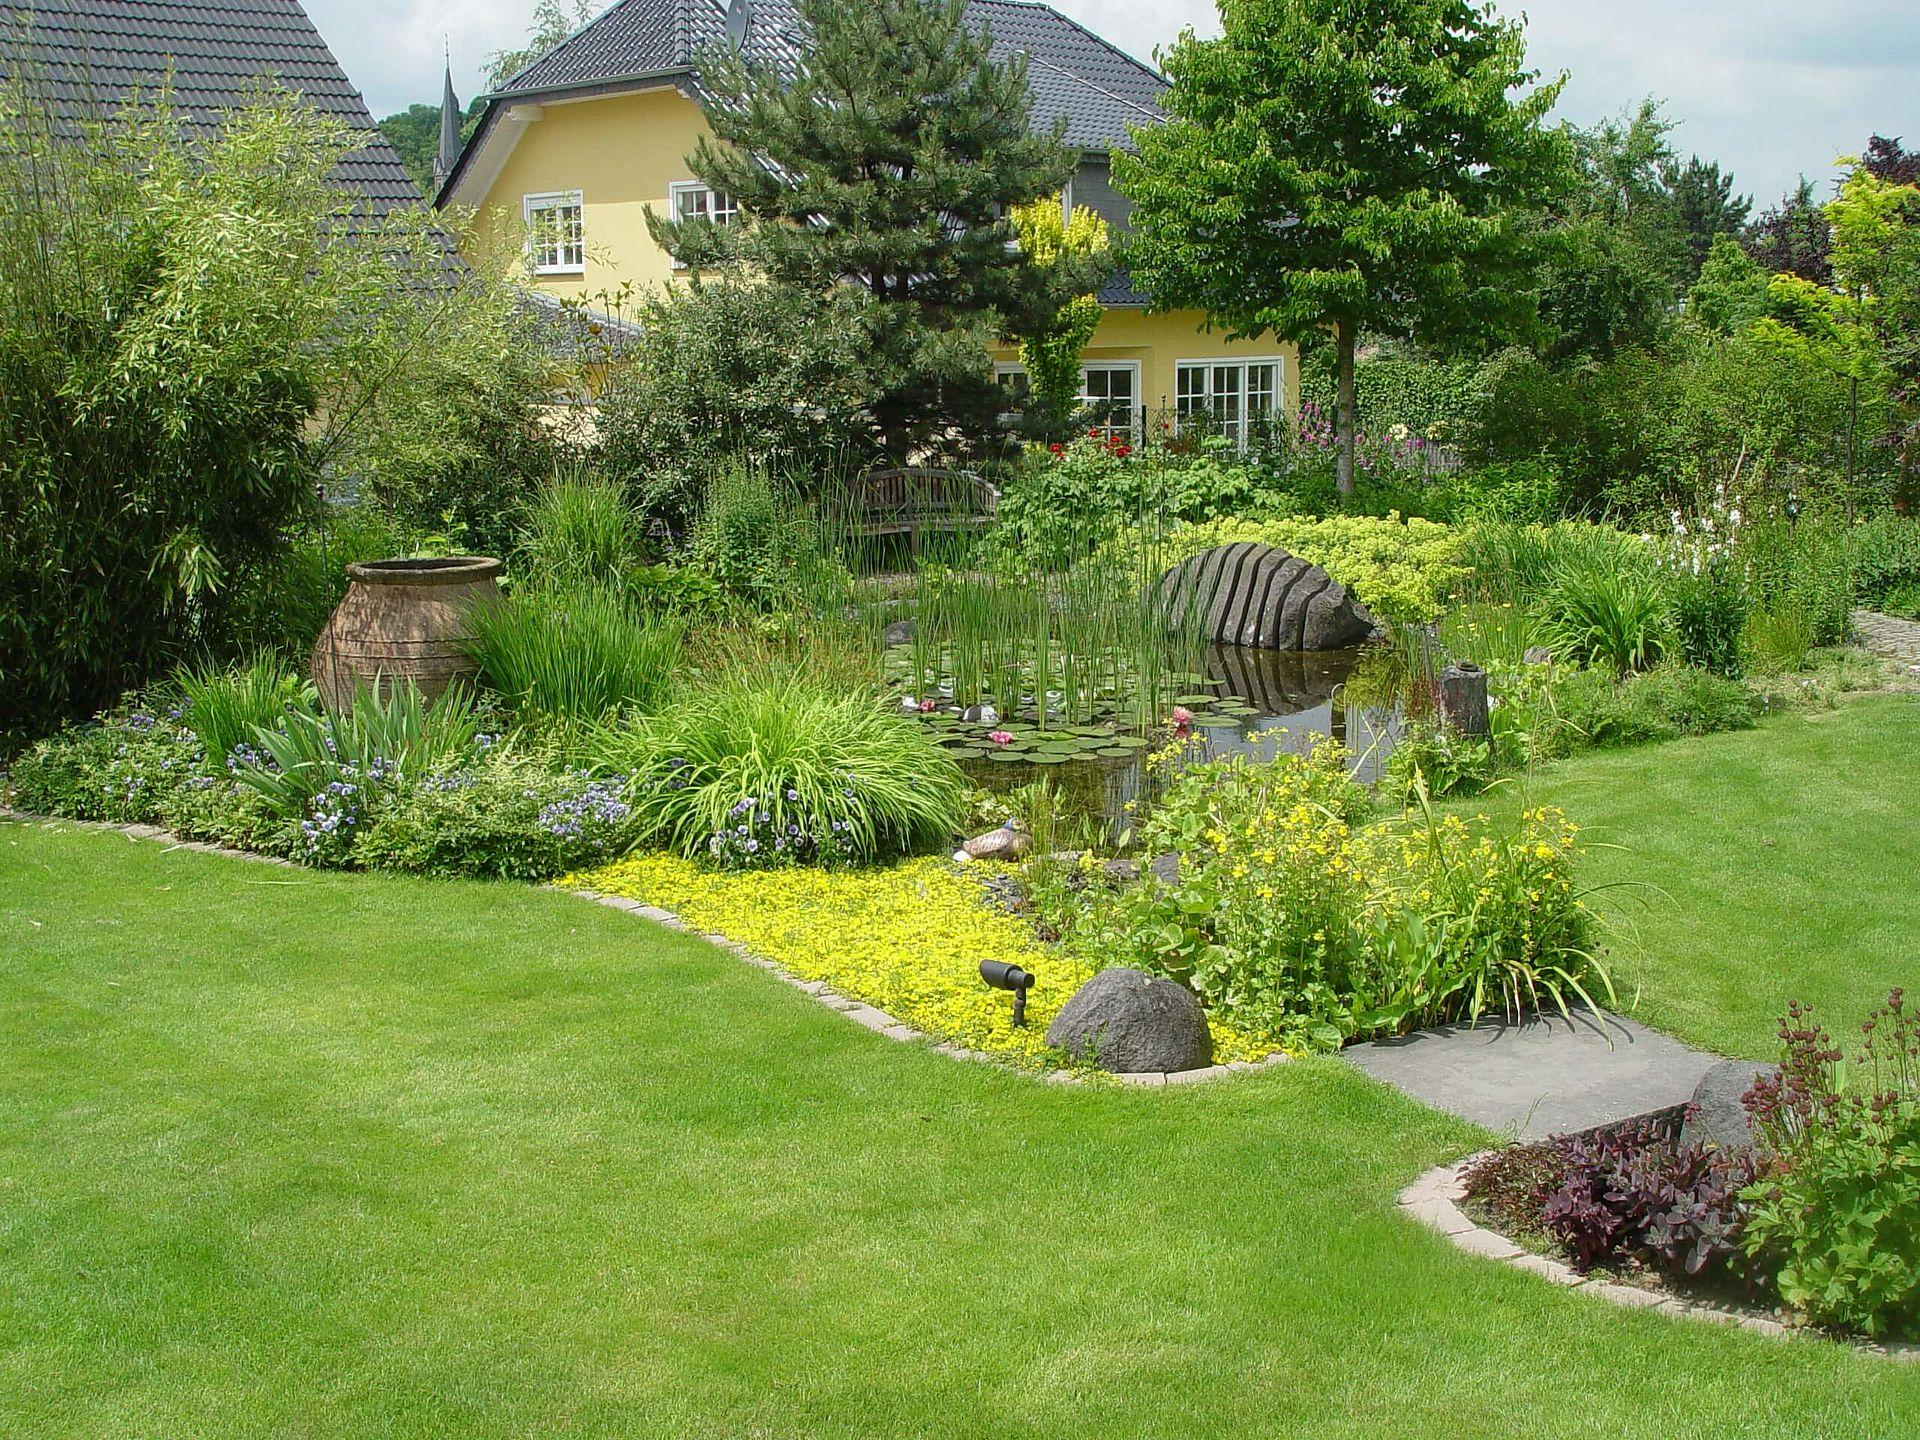 Gartengestaltung gartenbau gartenplanung landschaftsbau for Ideen gartengestaltung